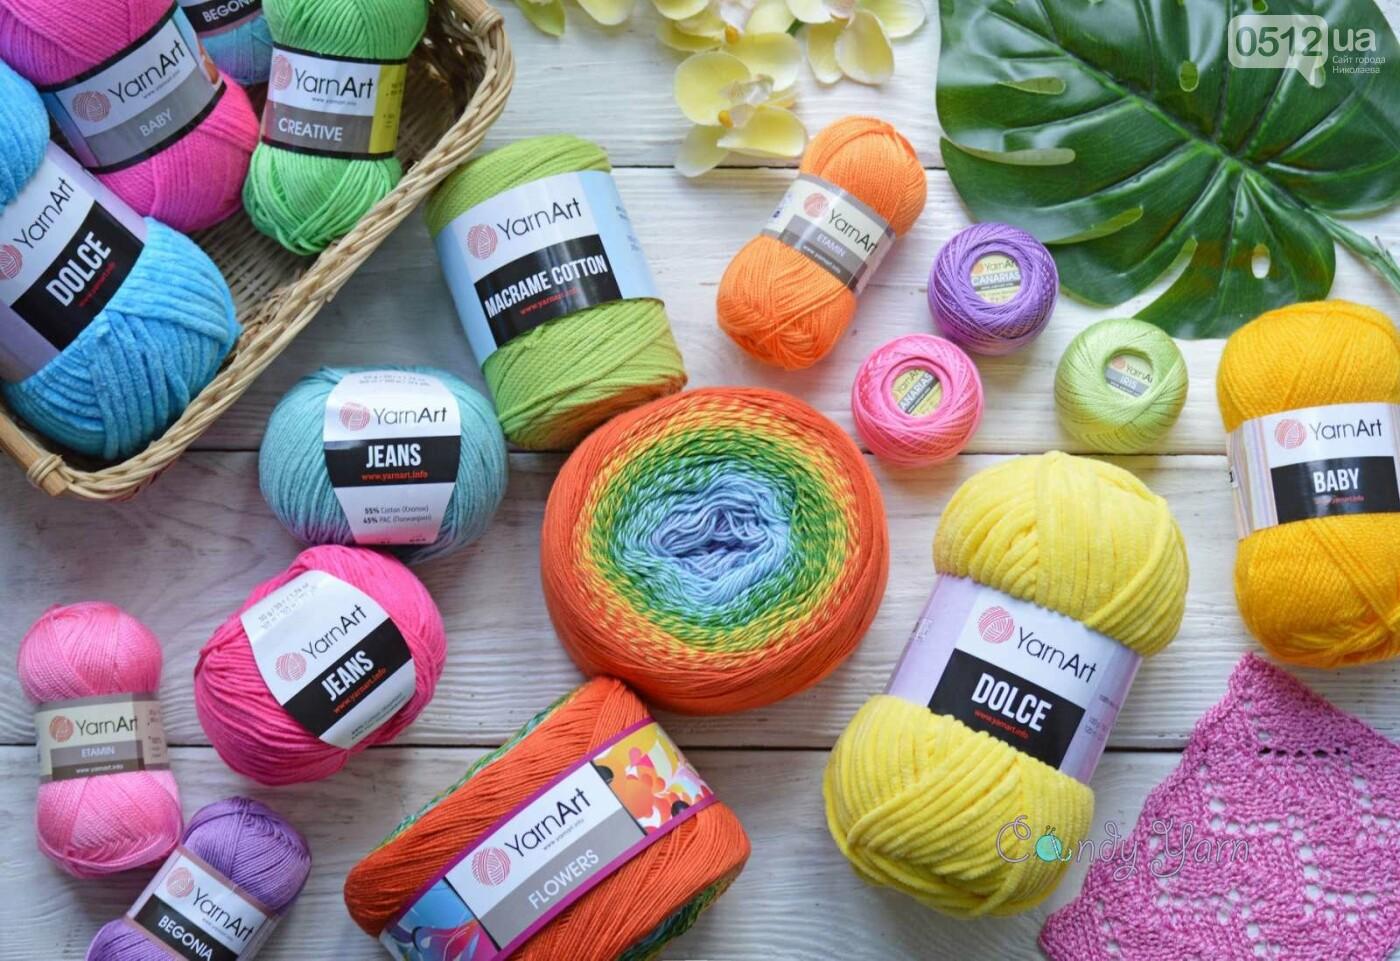 Пряжа для вязания ЯрнАрт, фото-2